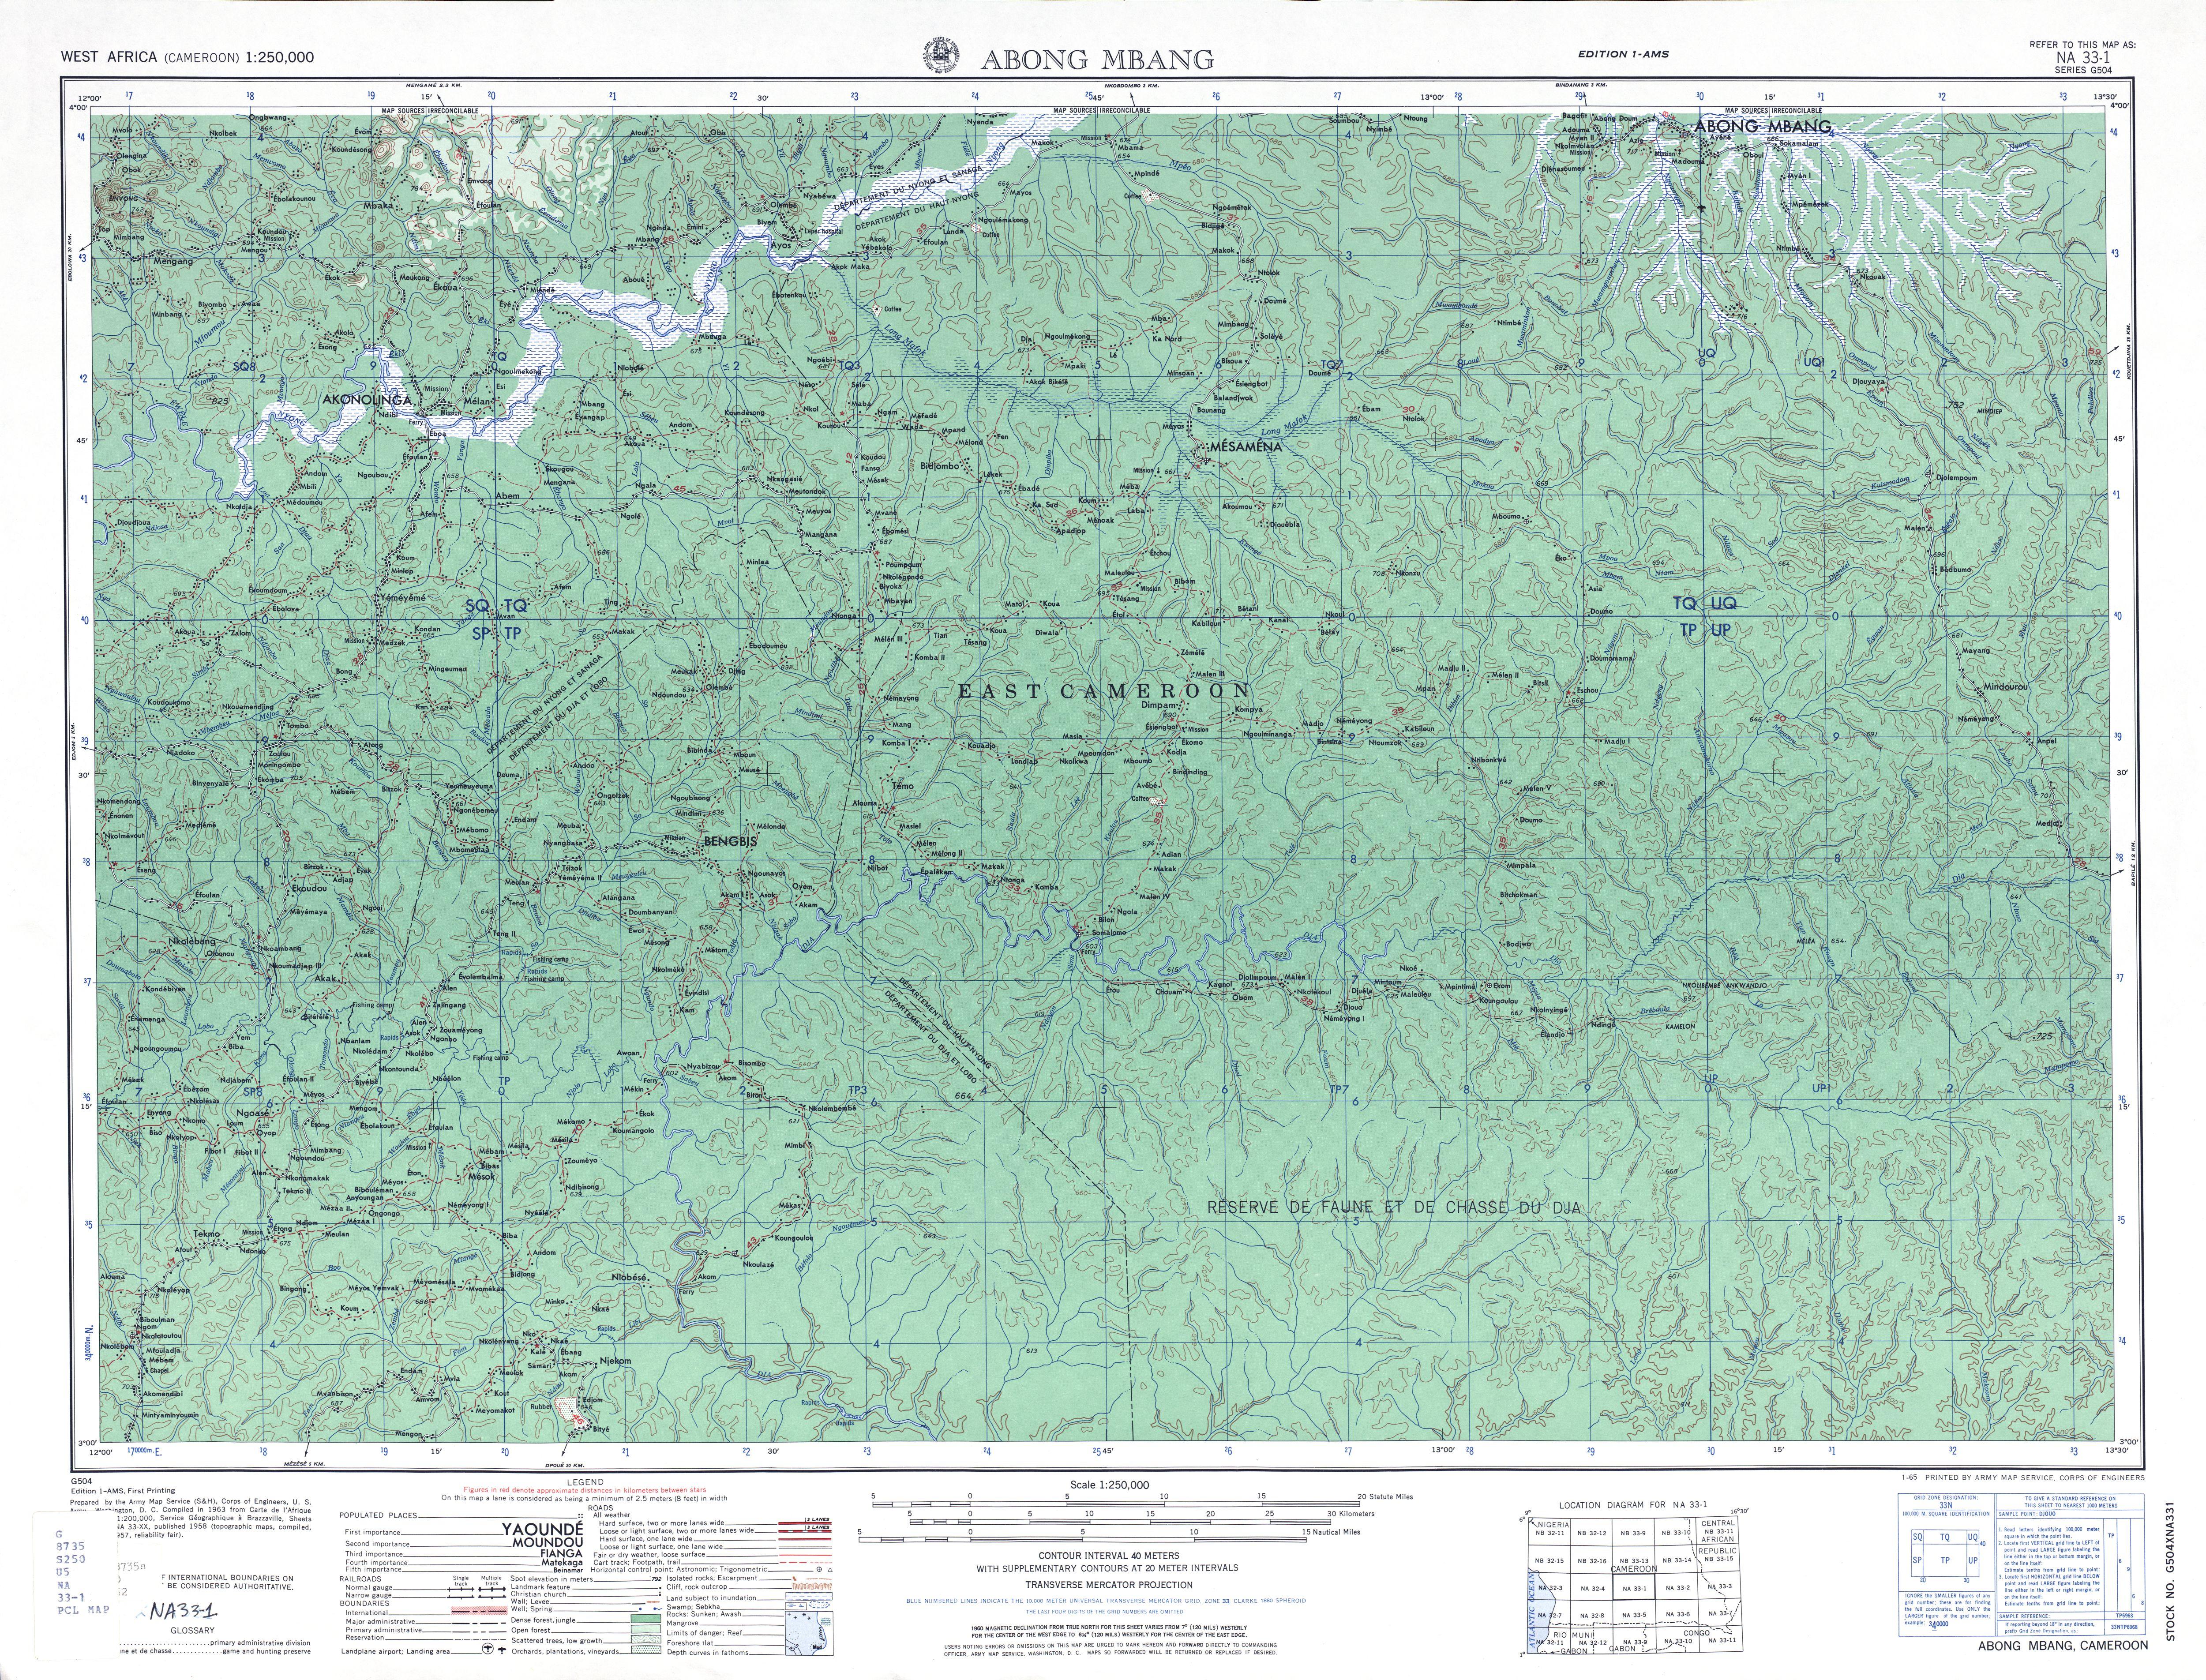 Hoja Abong Mbang del Mapa Topográfico de África Occidental 1955